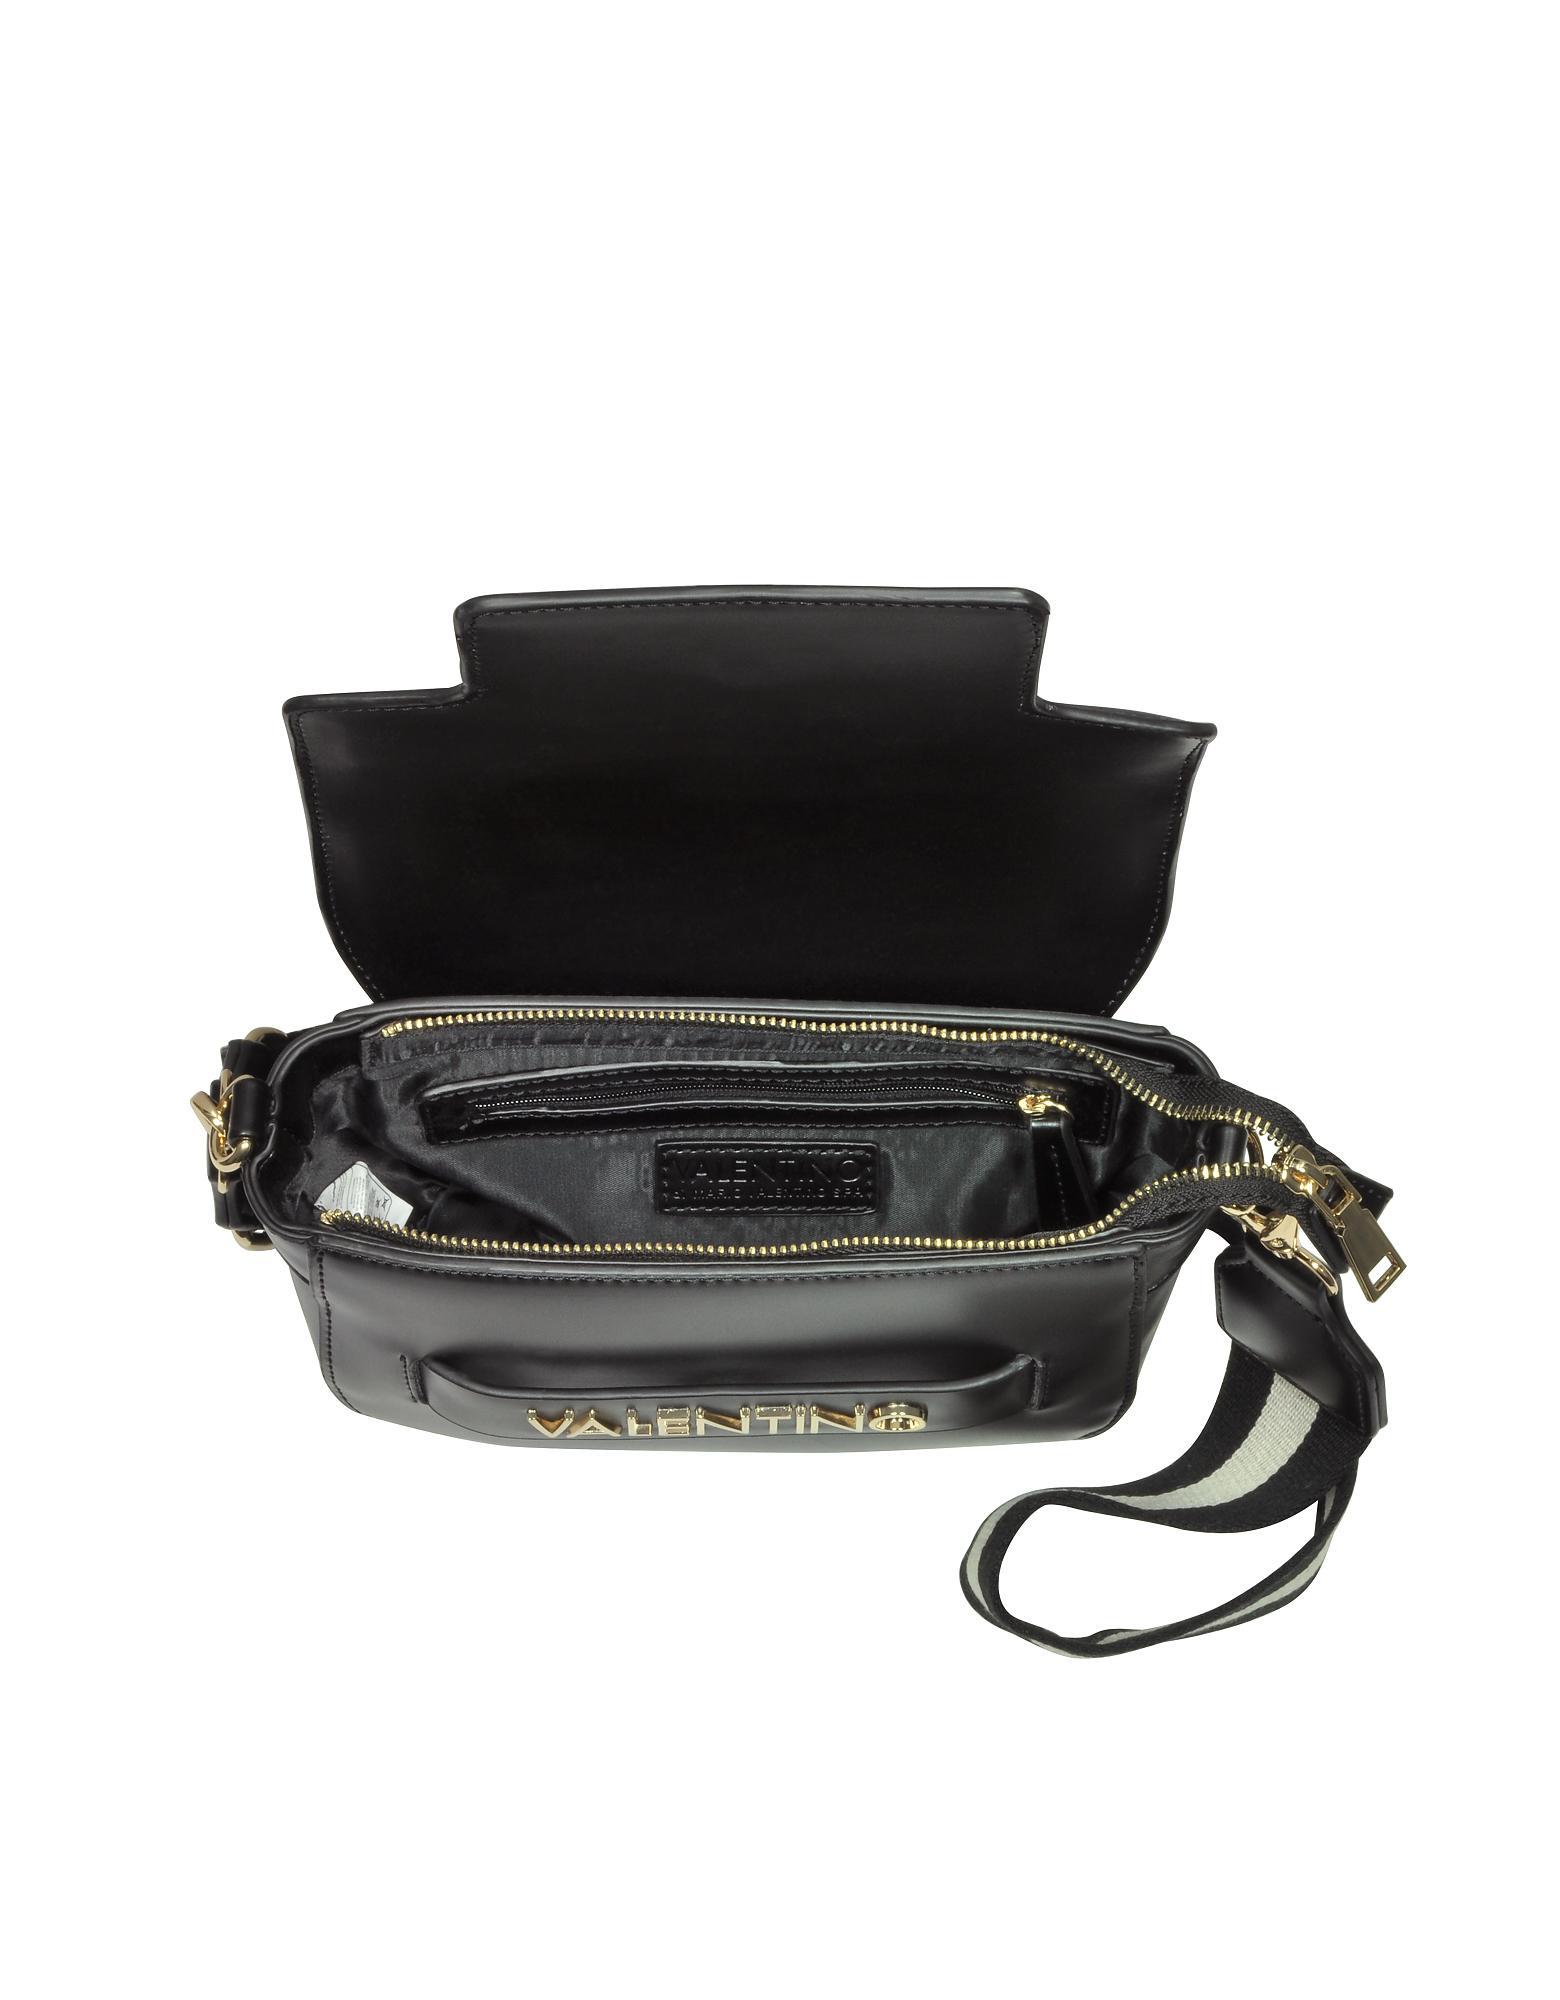 Lyst - Valentino By Mario Valentino Eco Leather Blast Shoulder Bag W ... e9a9aa33fbda6